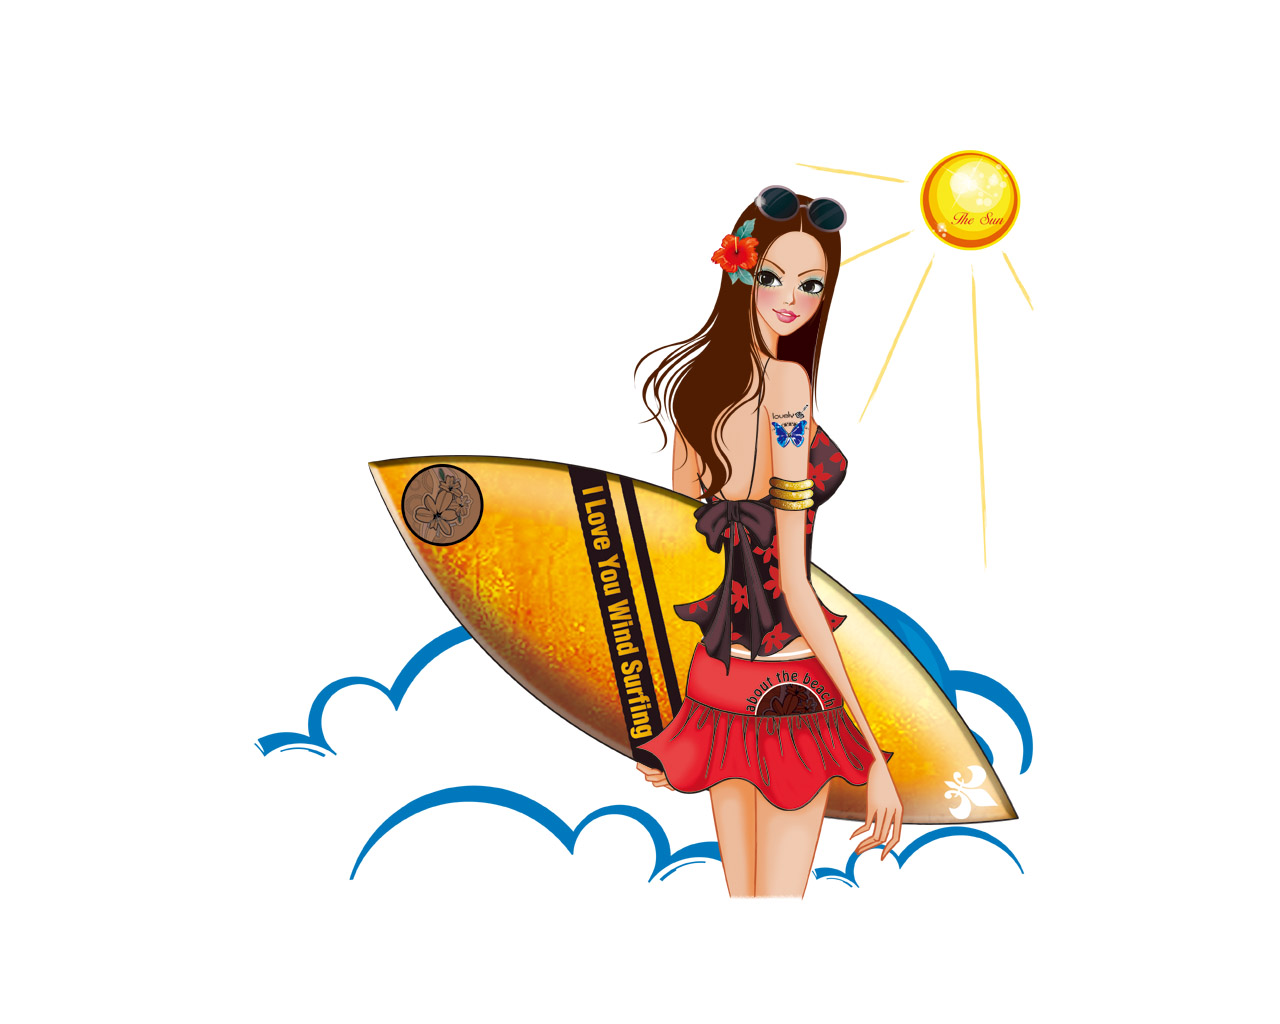 http://3.bp.blogspot.com/_GhlVI6dsgG8/TDMnBjfPIhI/AAAAAAAAAxw/Zy-hiCX6lRQ/s1600/surf+girl.jpg